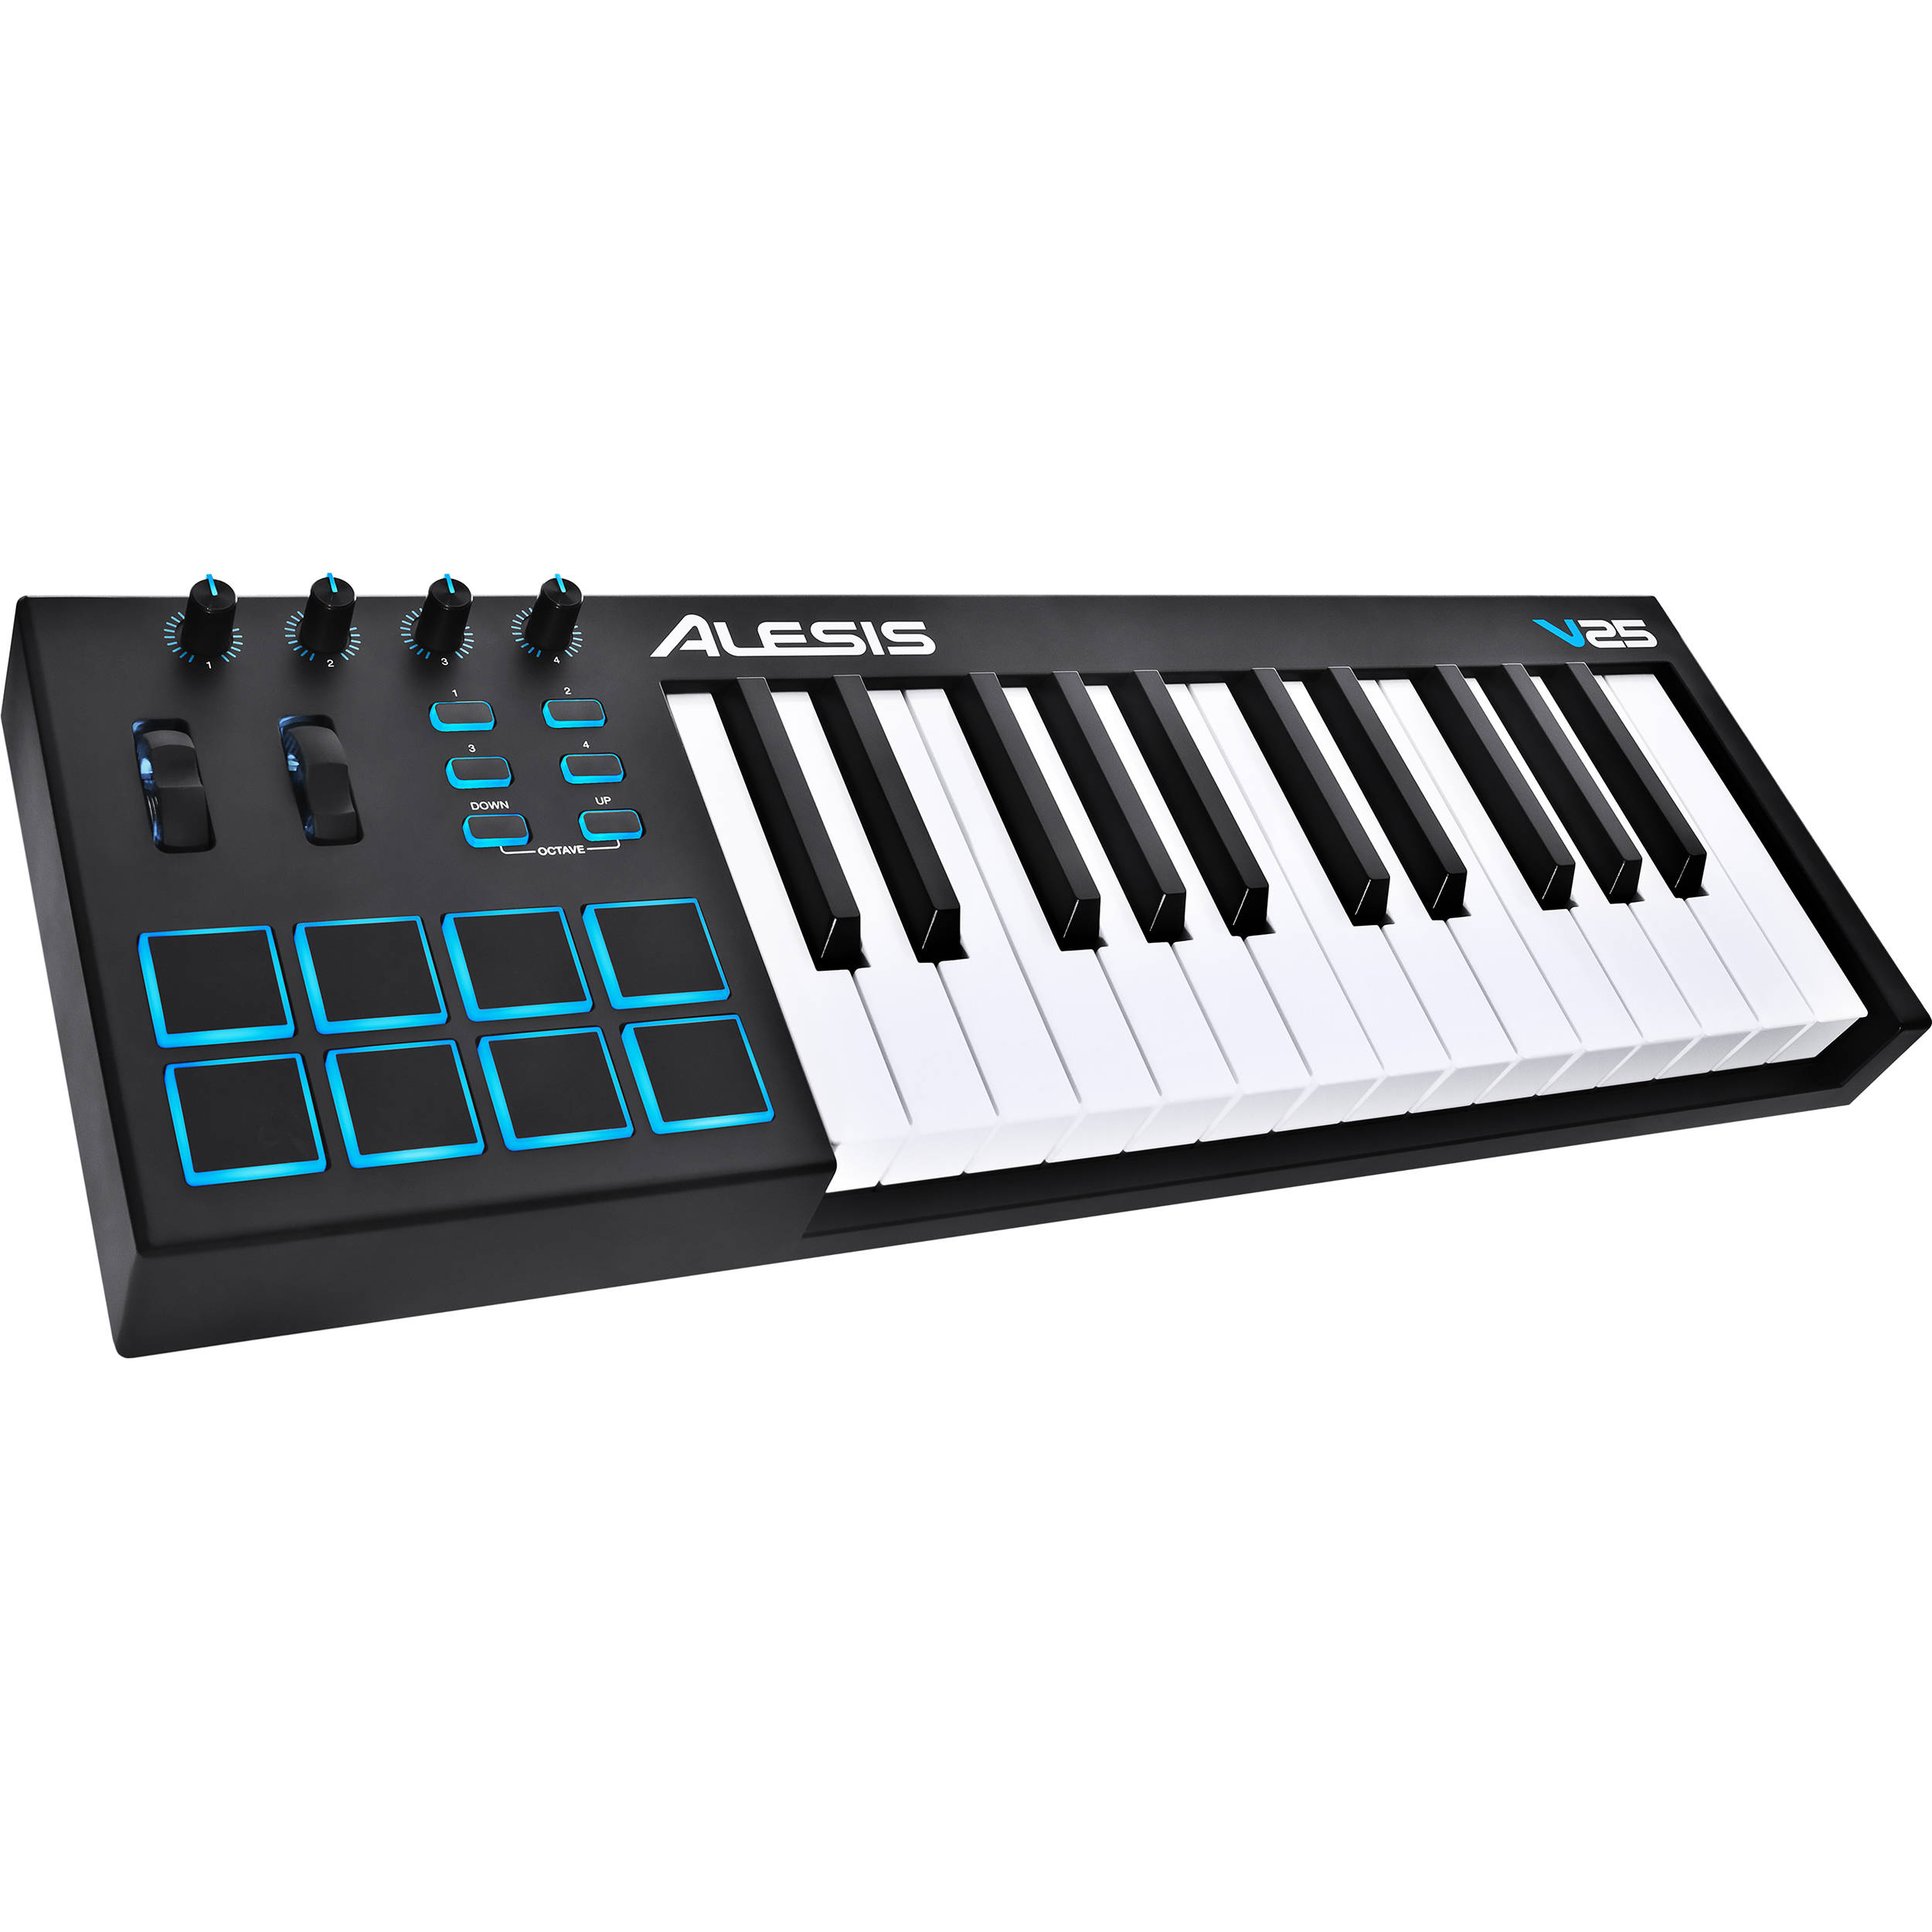 Alesis V25 25-Key USB MIDI Keyboard Controller V25 B&H Photo